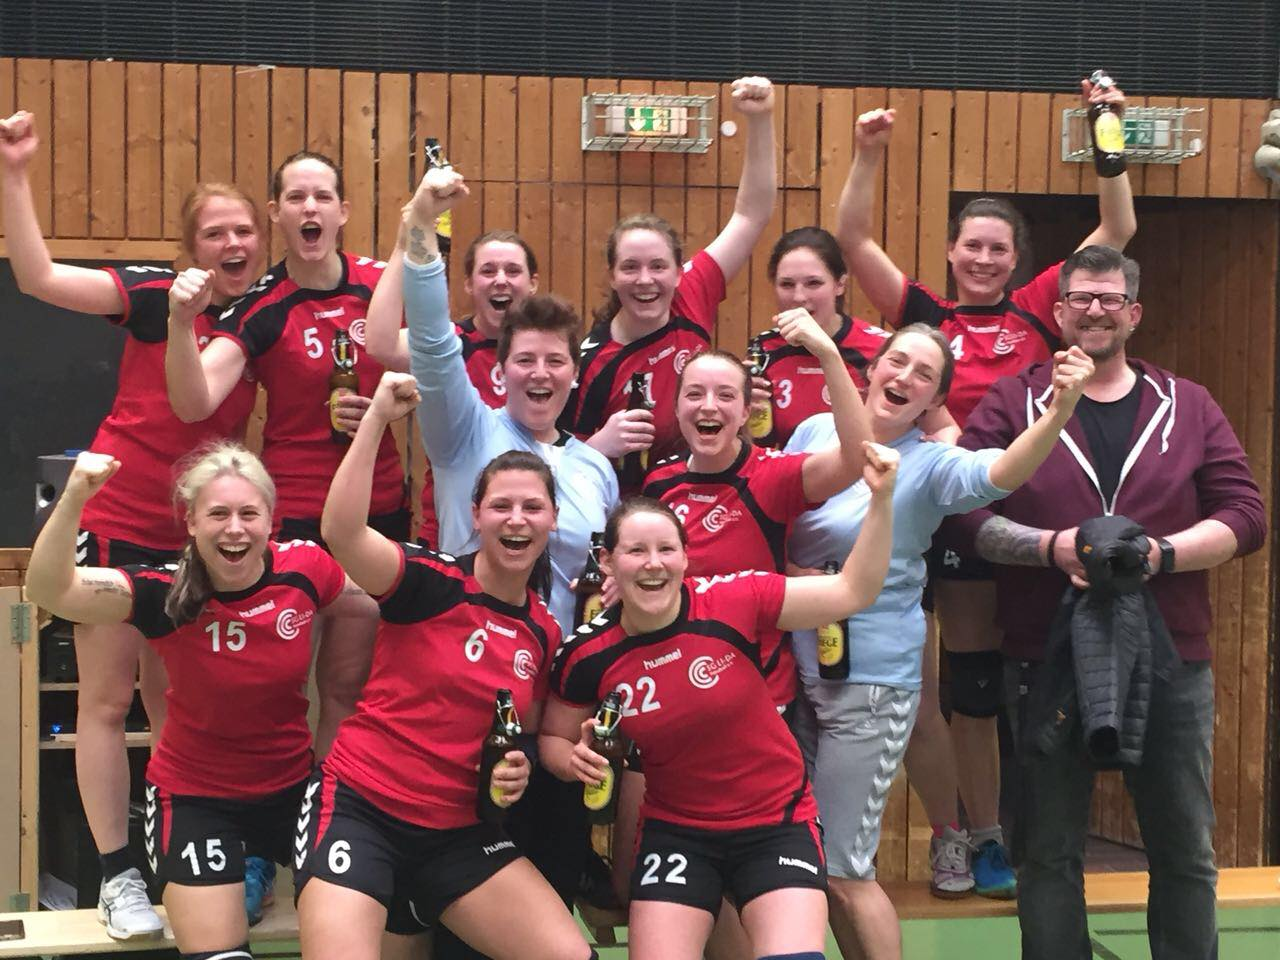 Damen gewinnen Pokalhalbfinale 2018